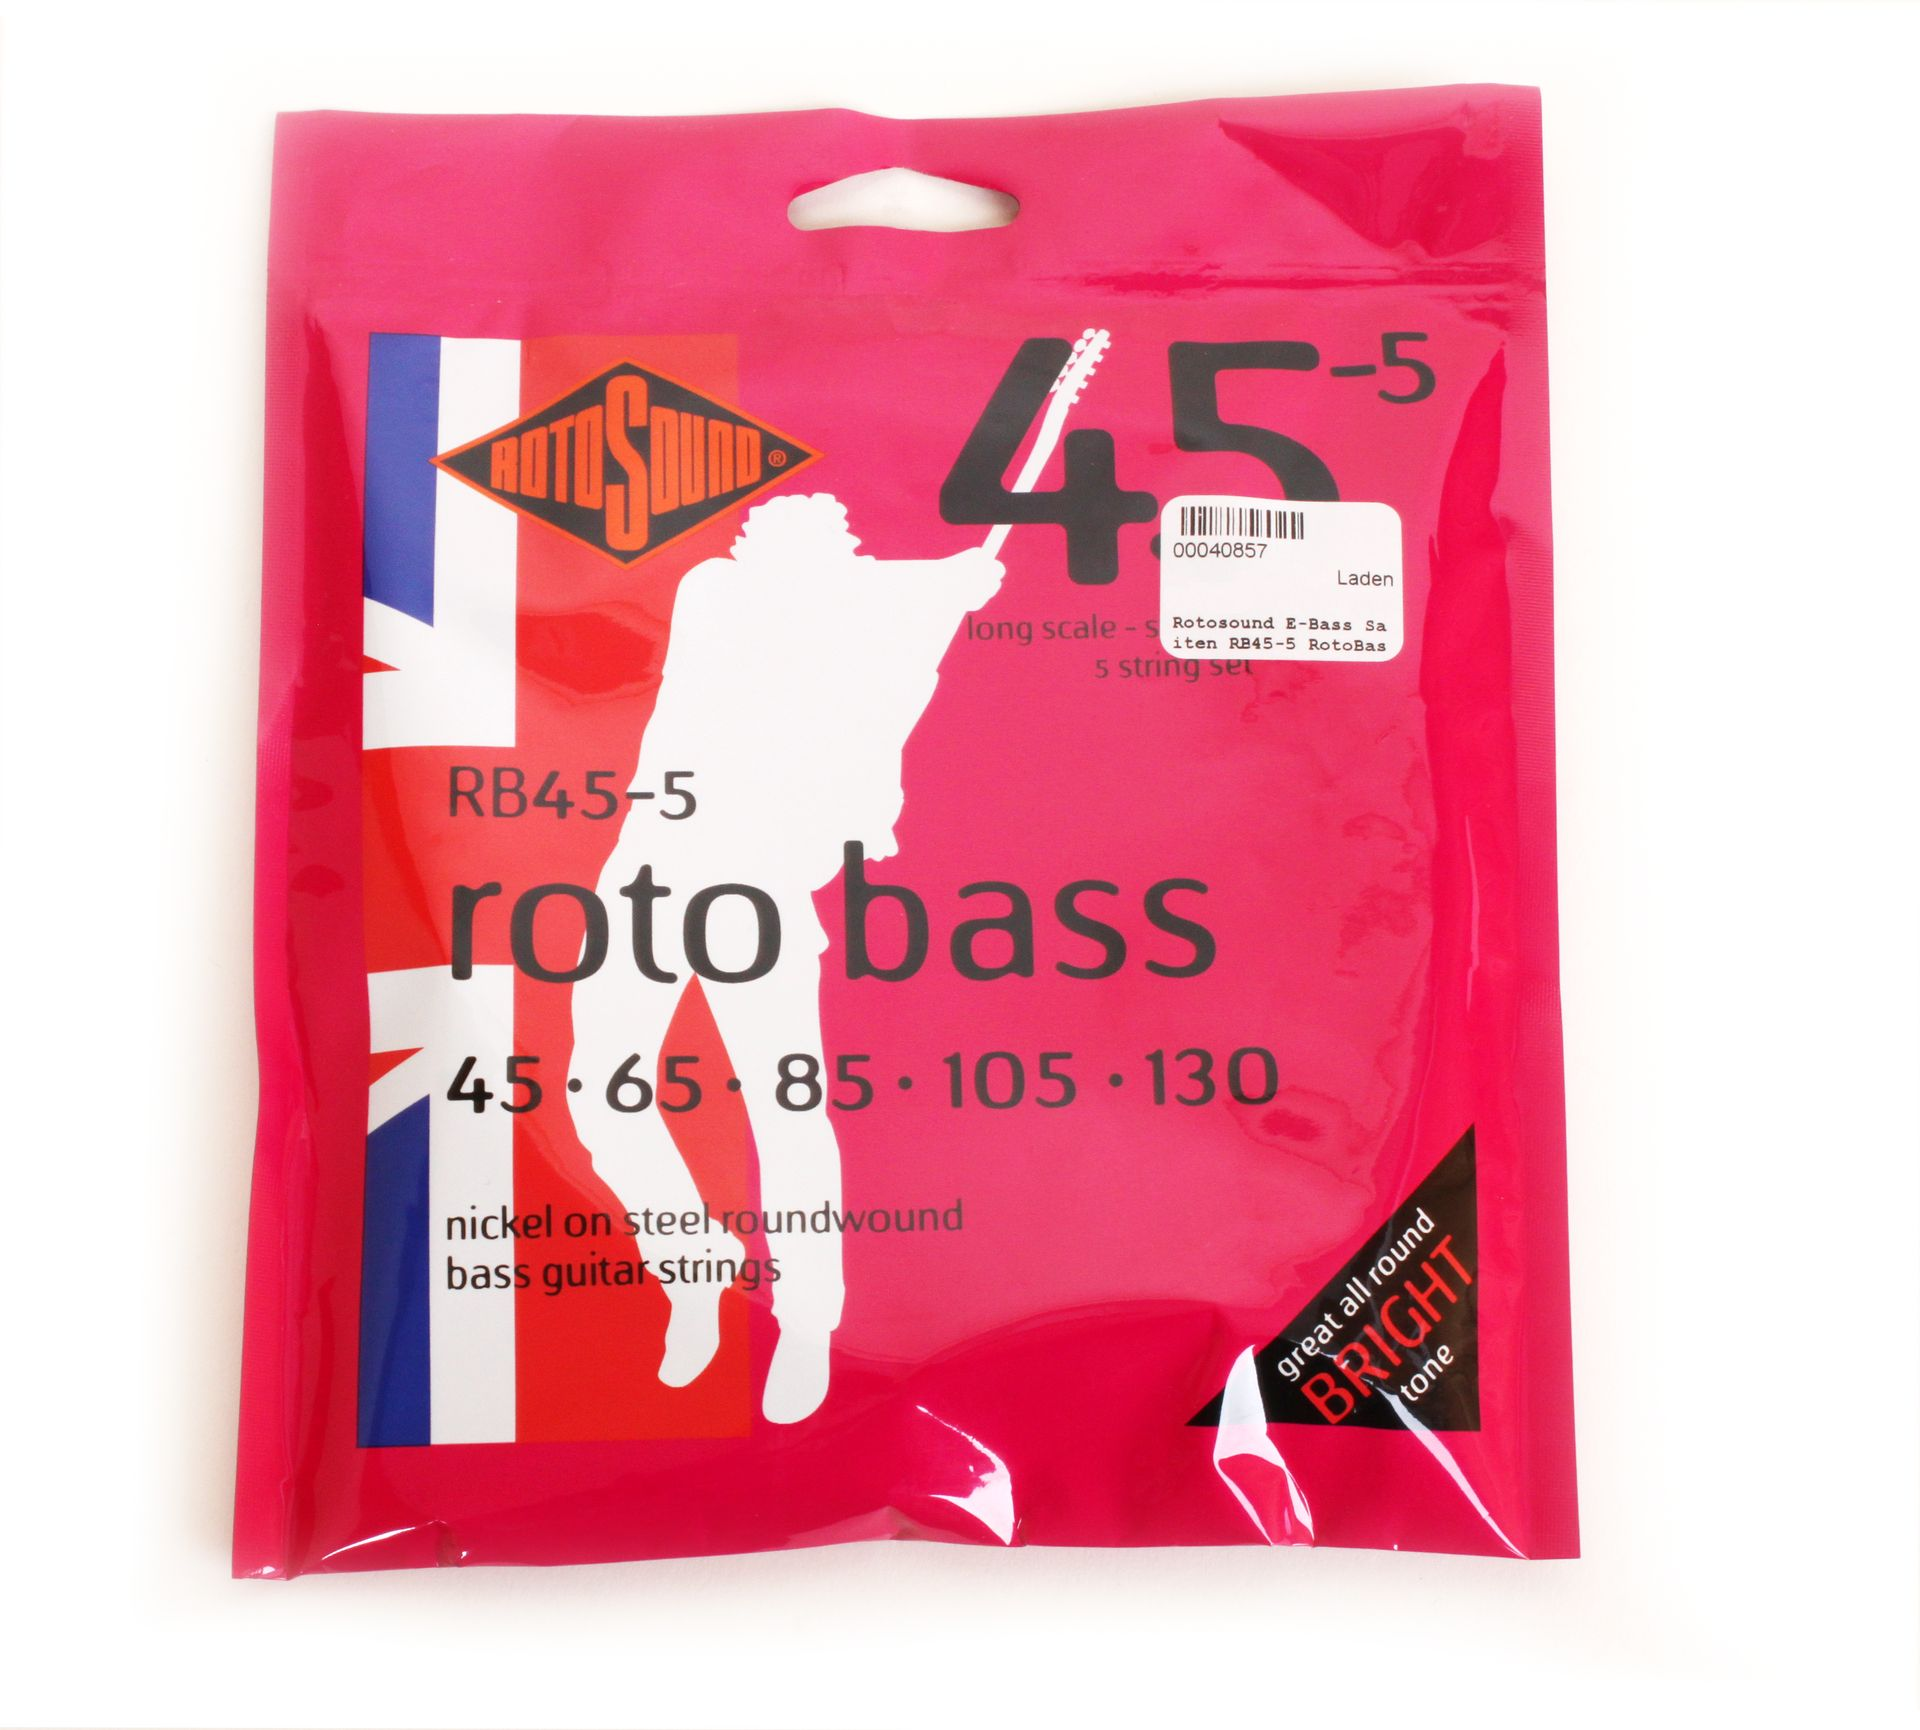 Rotosound E-Bass Saiten RB45-5 RotoBass